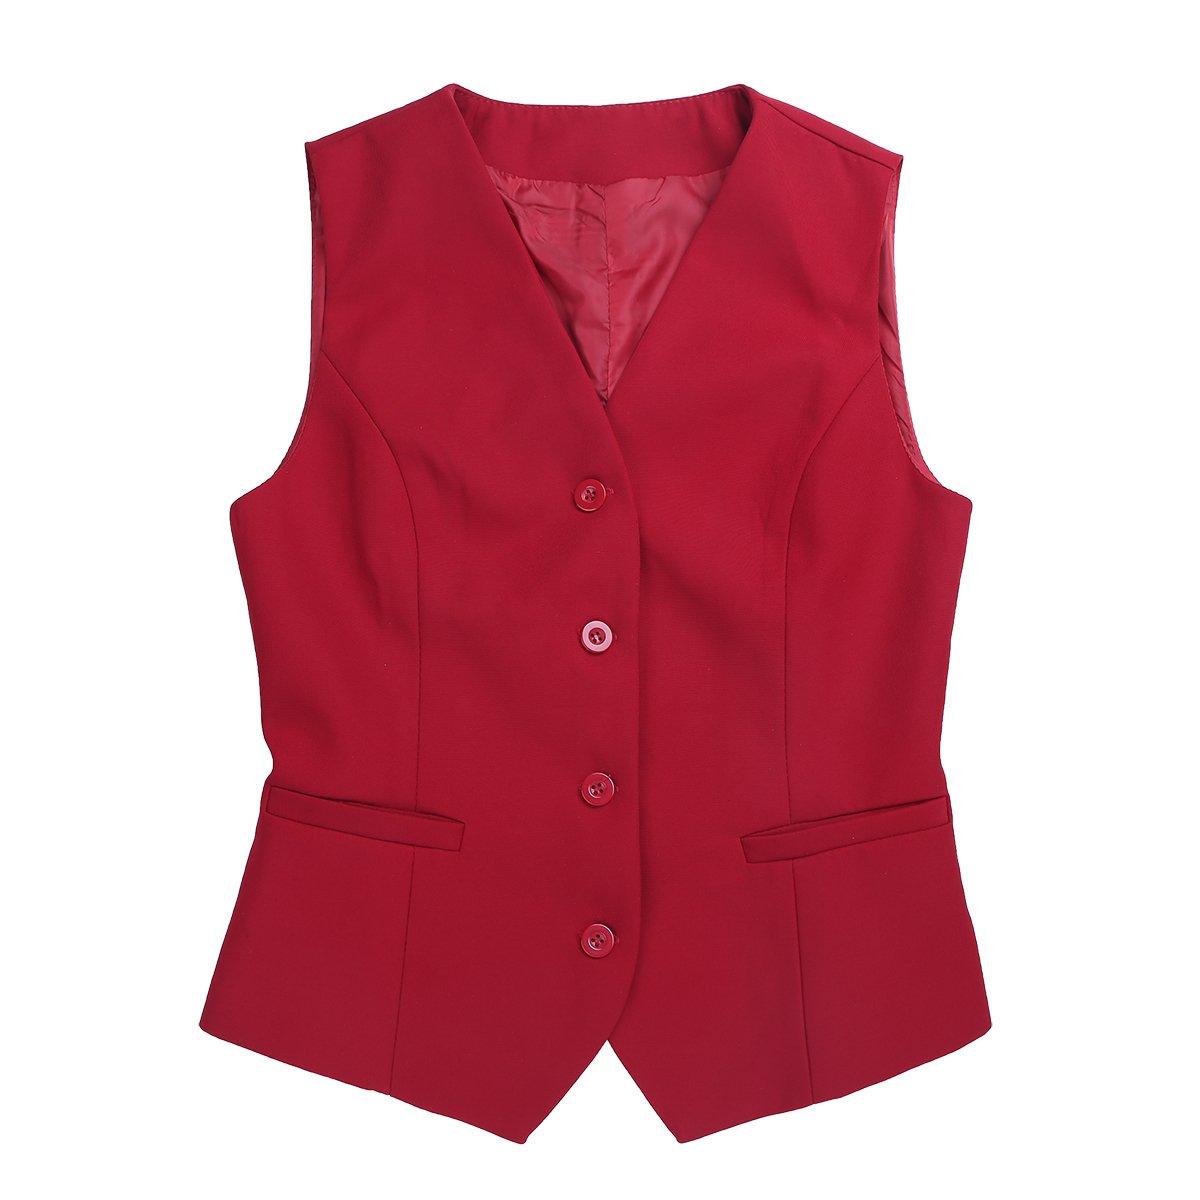 iiniim Fashion Women V-Neck Sleeveless Fully Lined Slim Fit Economy Dressy Suit Vest Waistcoat